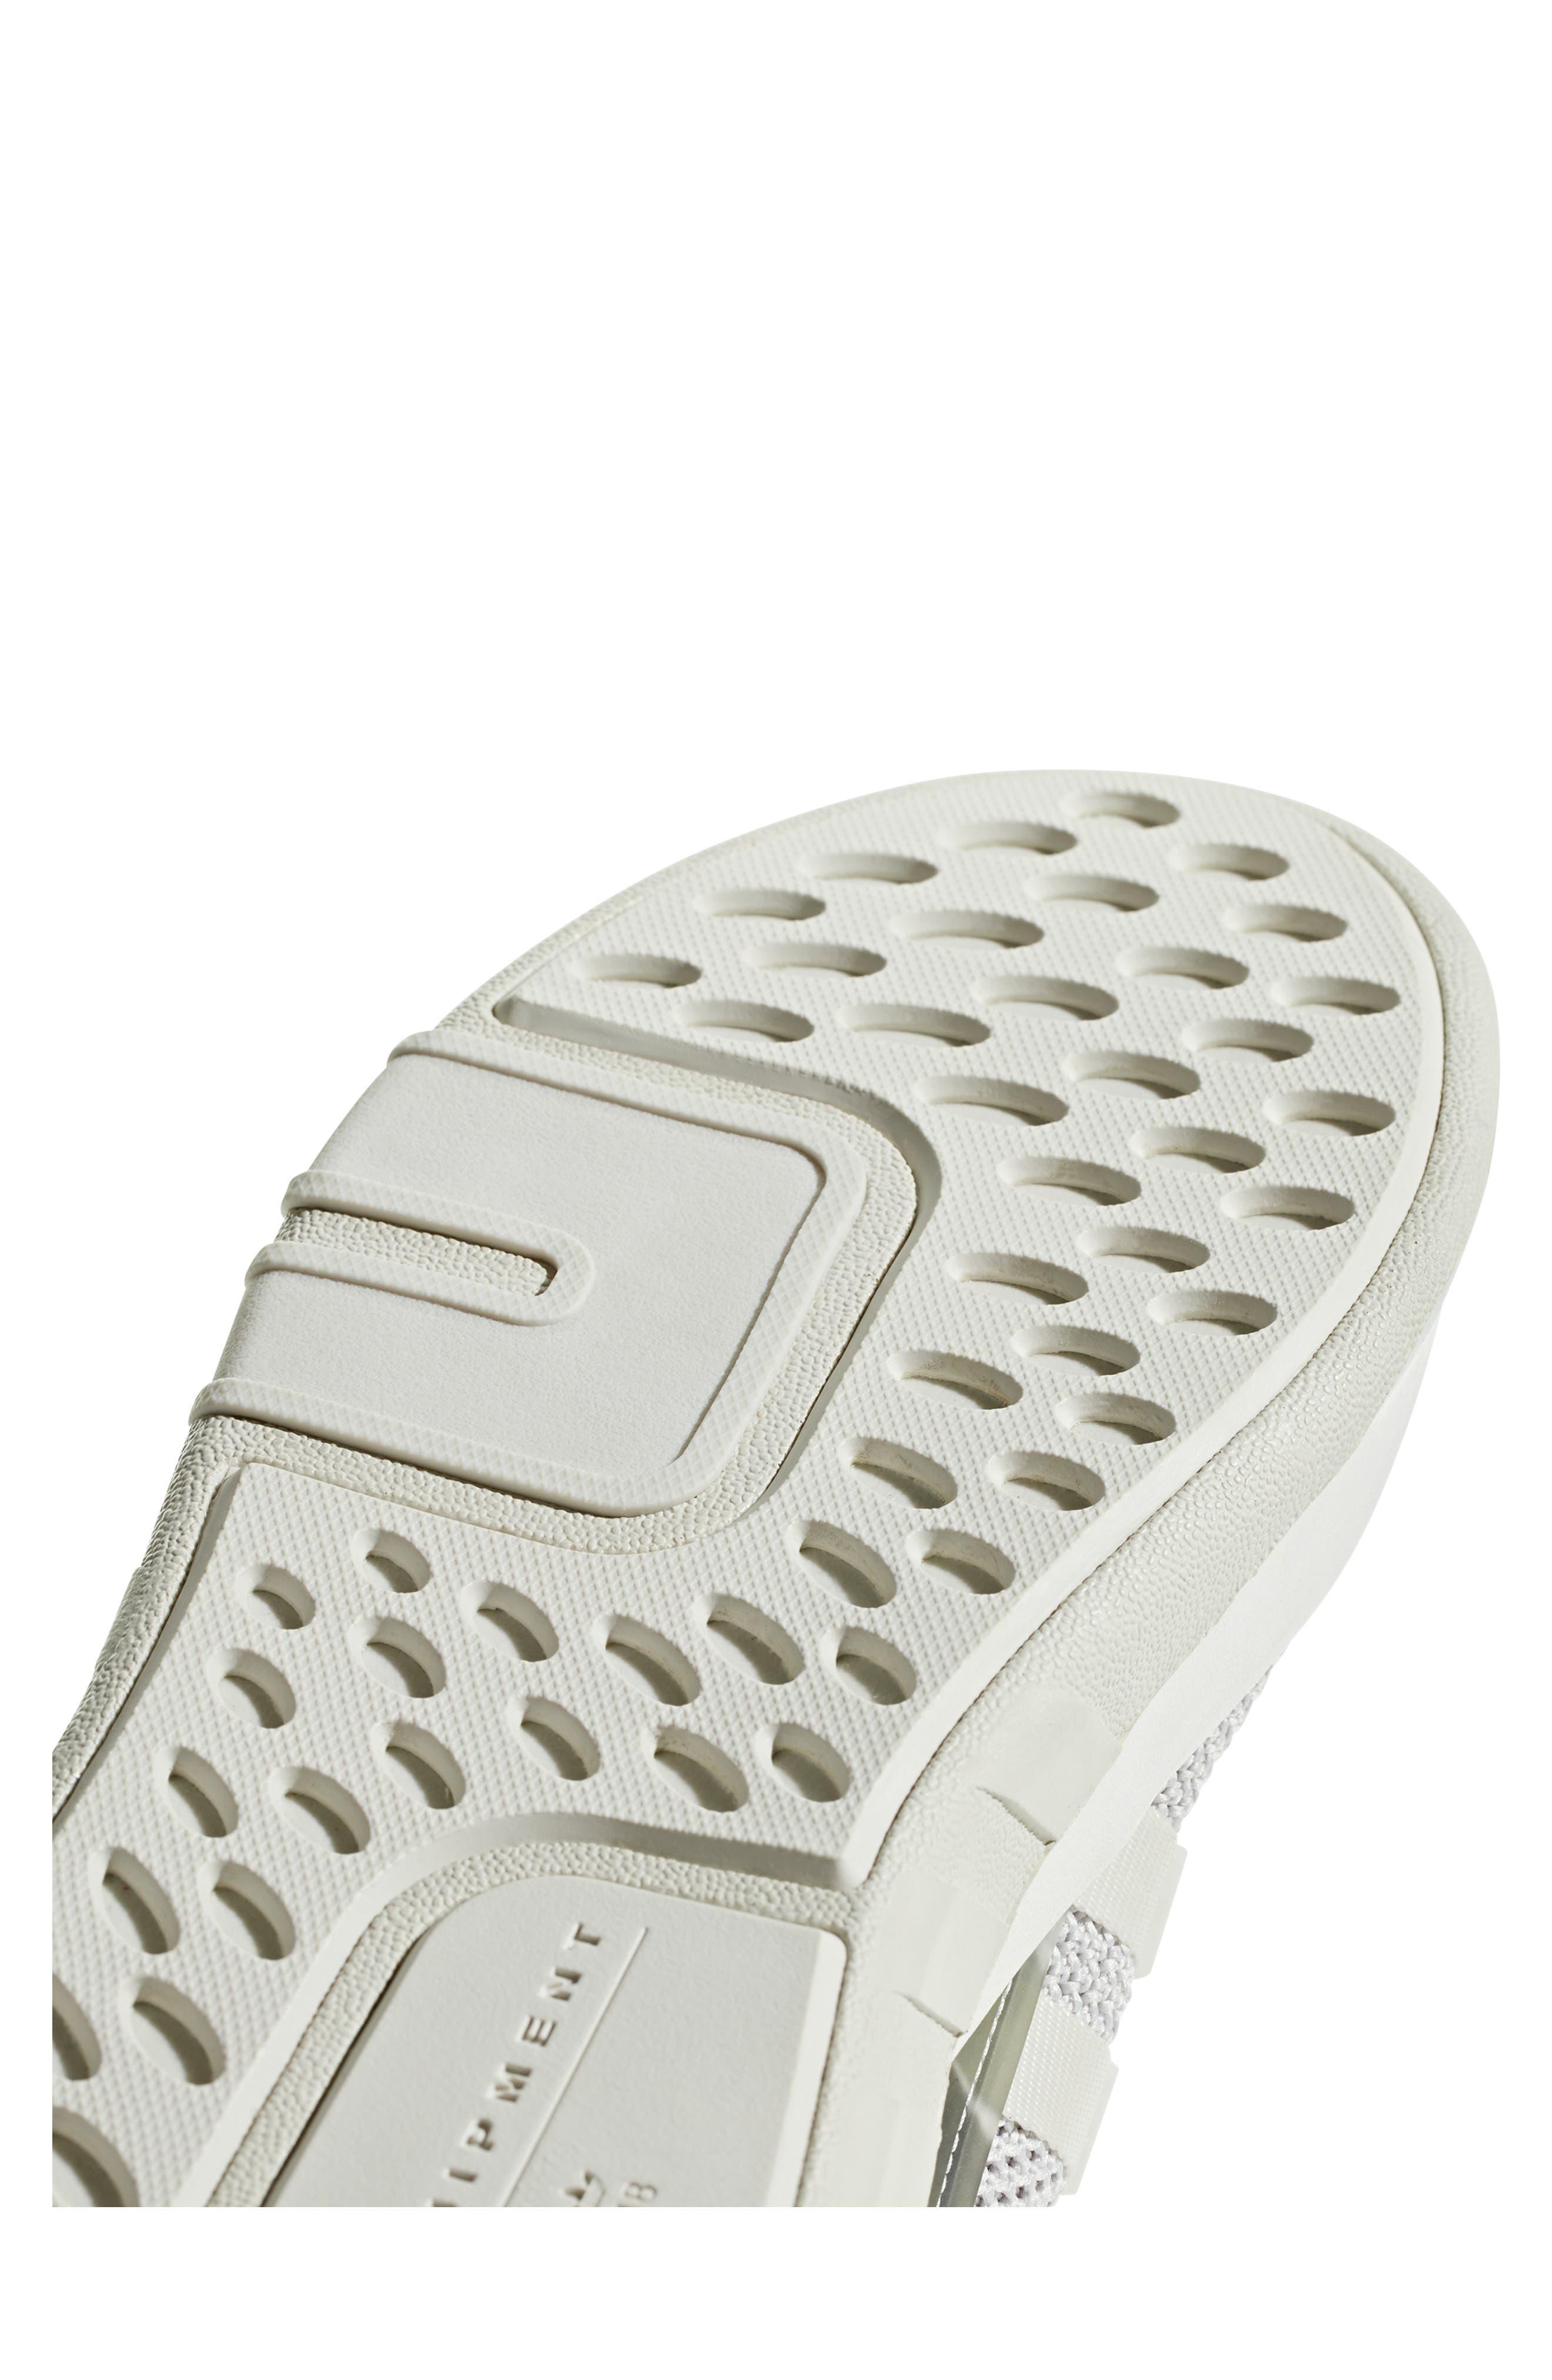 EQT Basketball ADV Sneaker,                             Alternate thumbnail 7, color,                             GREY/ CHALK WHITE